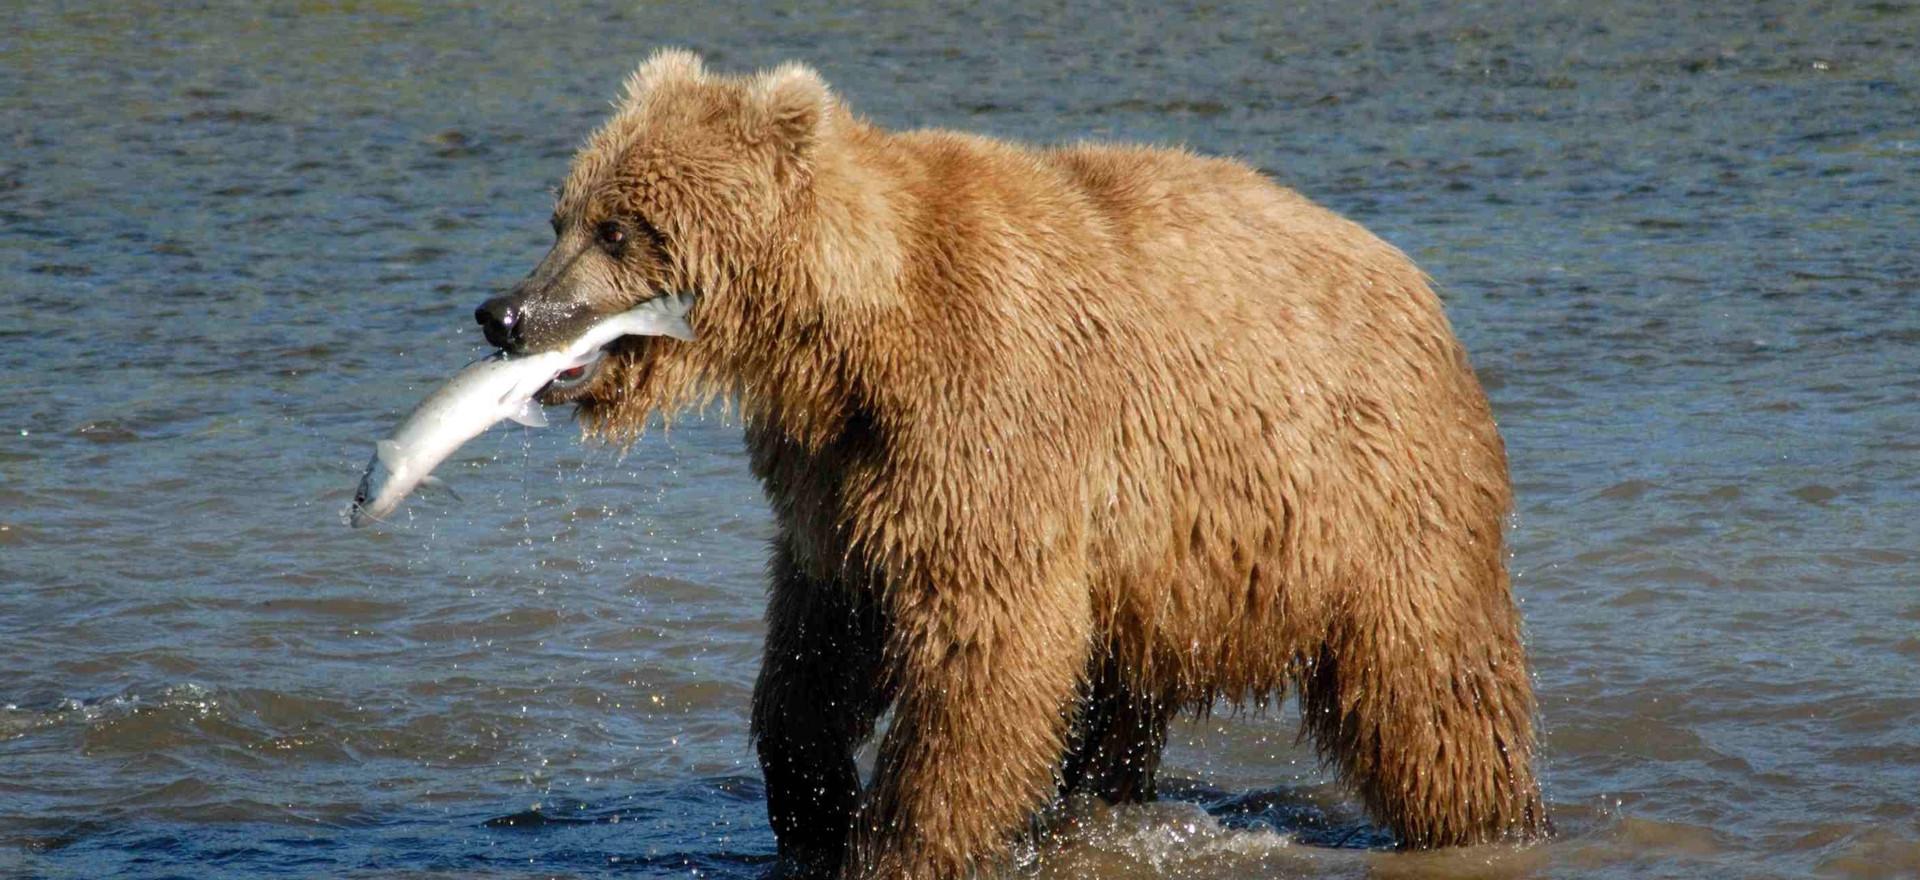 Bear_Alaska_(3)_edited.jpg